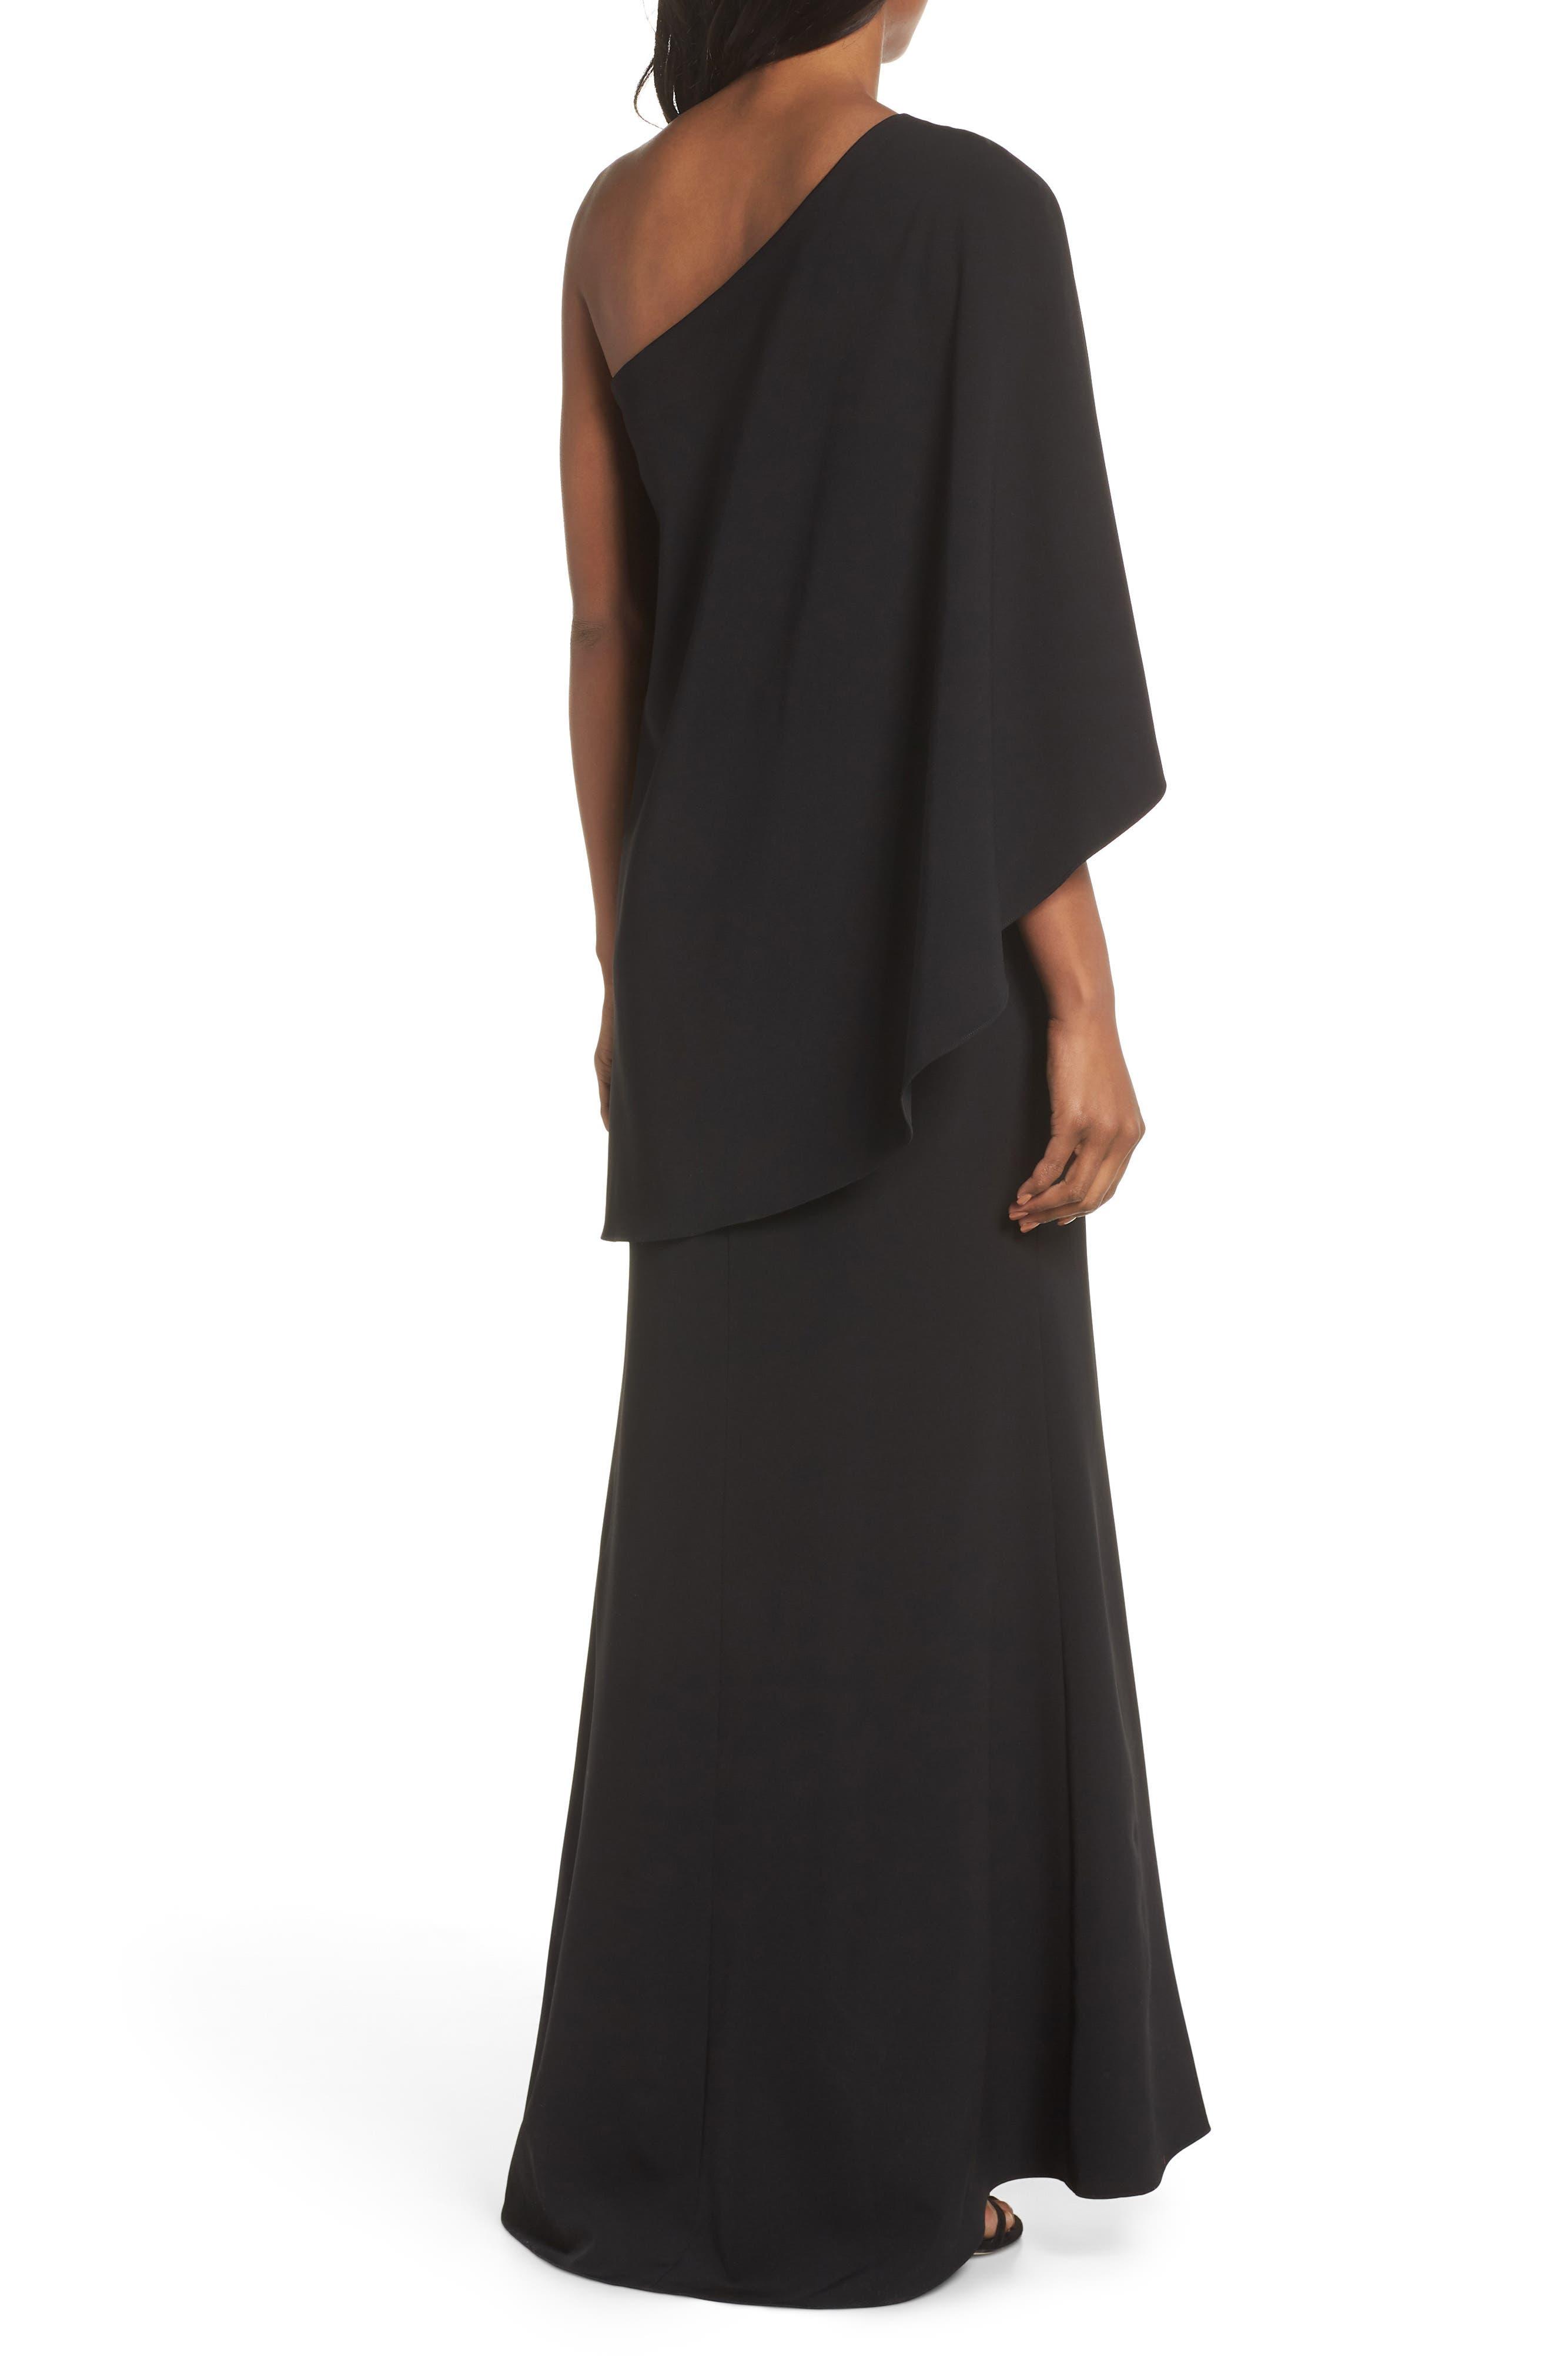 VINCE CAMUTO, One-Shoulder Cape Evening Dress, Alternate thumbnail 2, color, BLACK